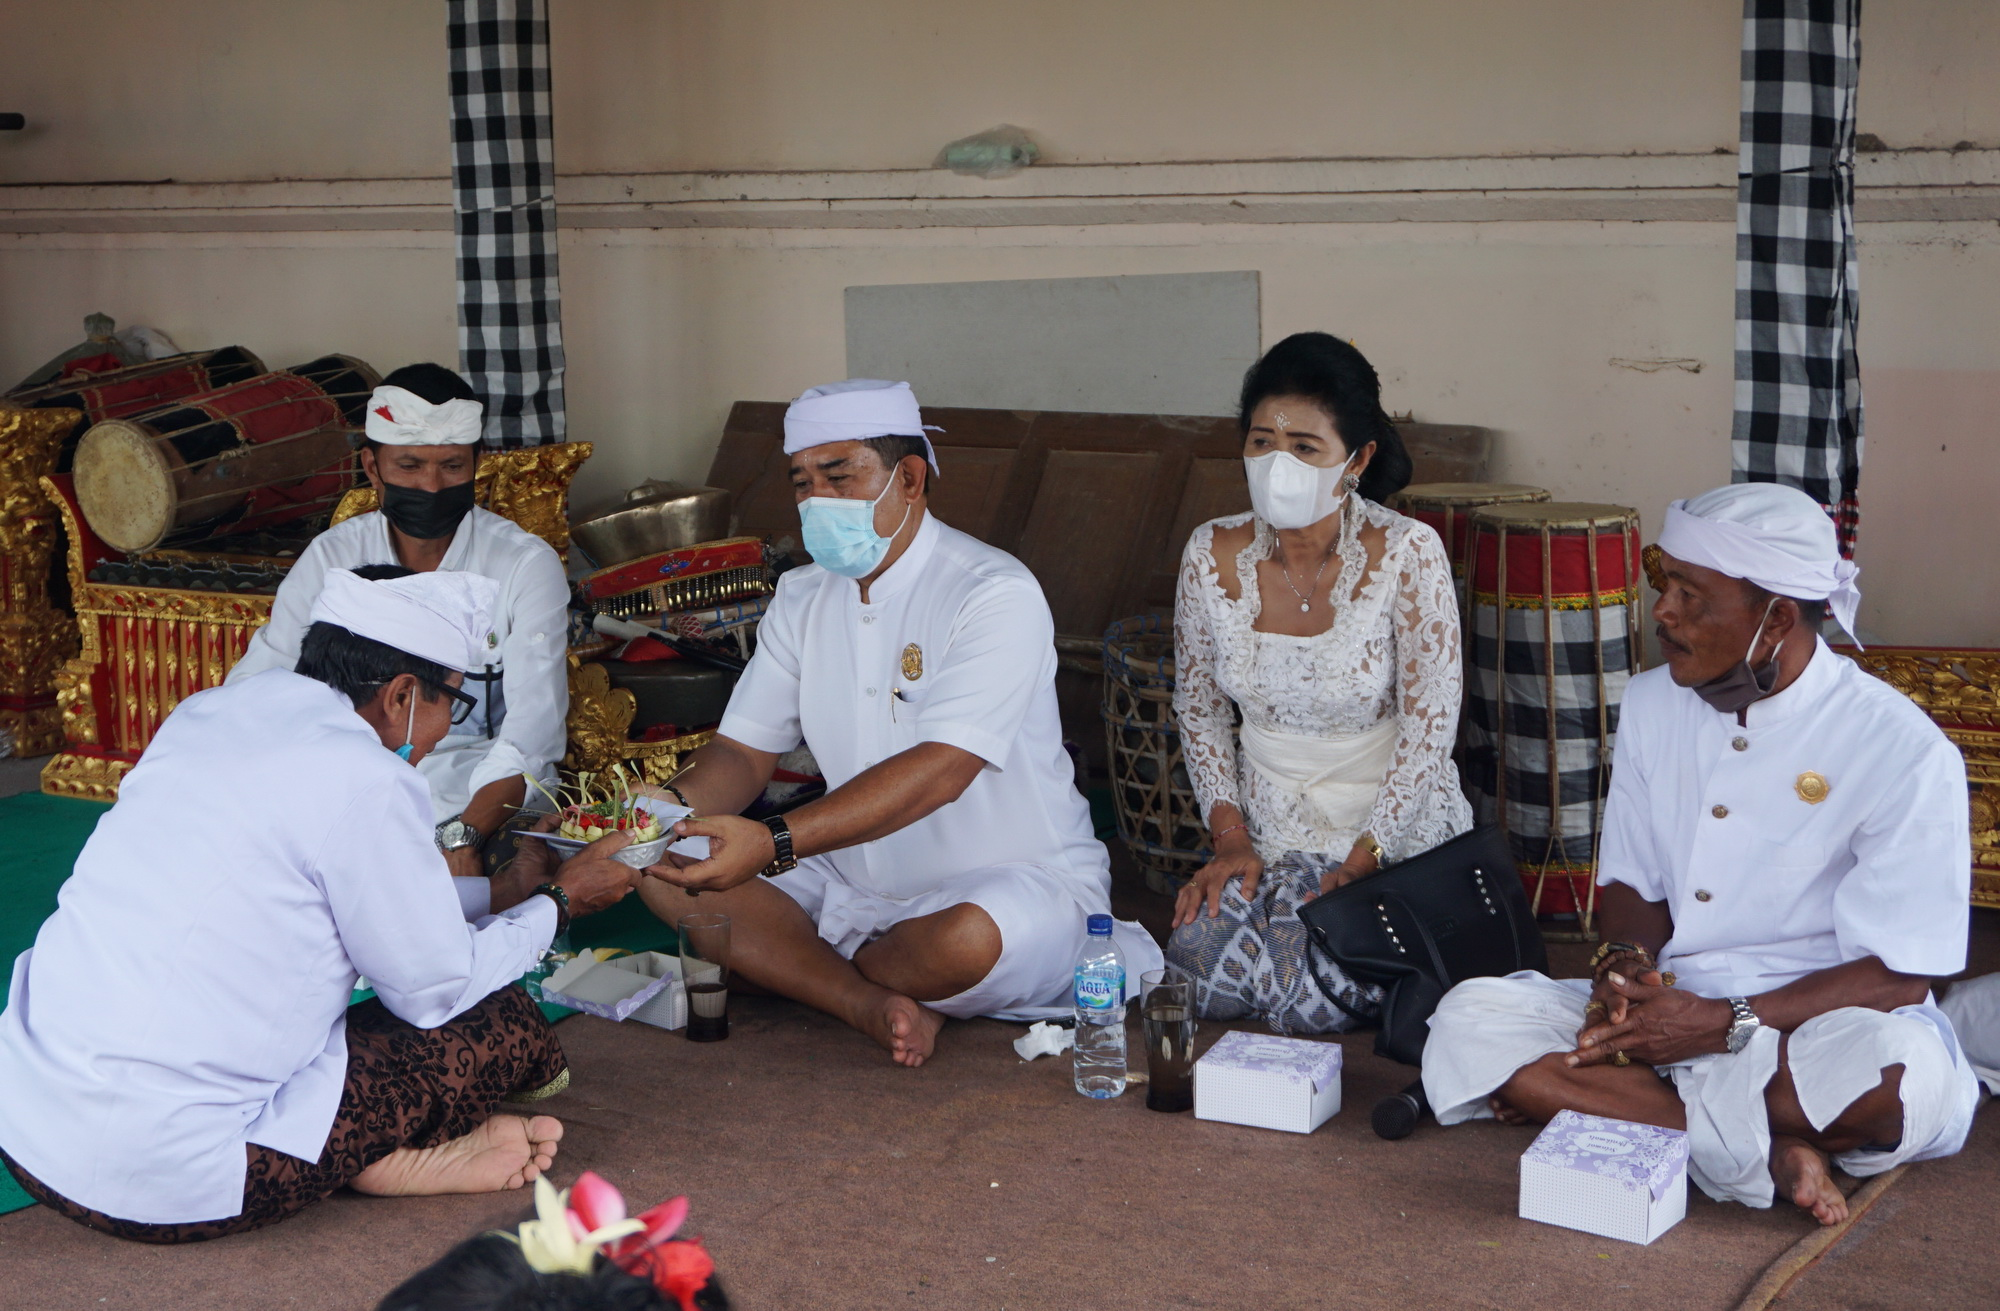 WABUP Kasta memberi dana punia saat pujawali di Pura Dalem Tangkup, Desa Adat Sengkiding, Kecamatan Banjarangkan, Selasa (15/12/2020). Foto: ist